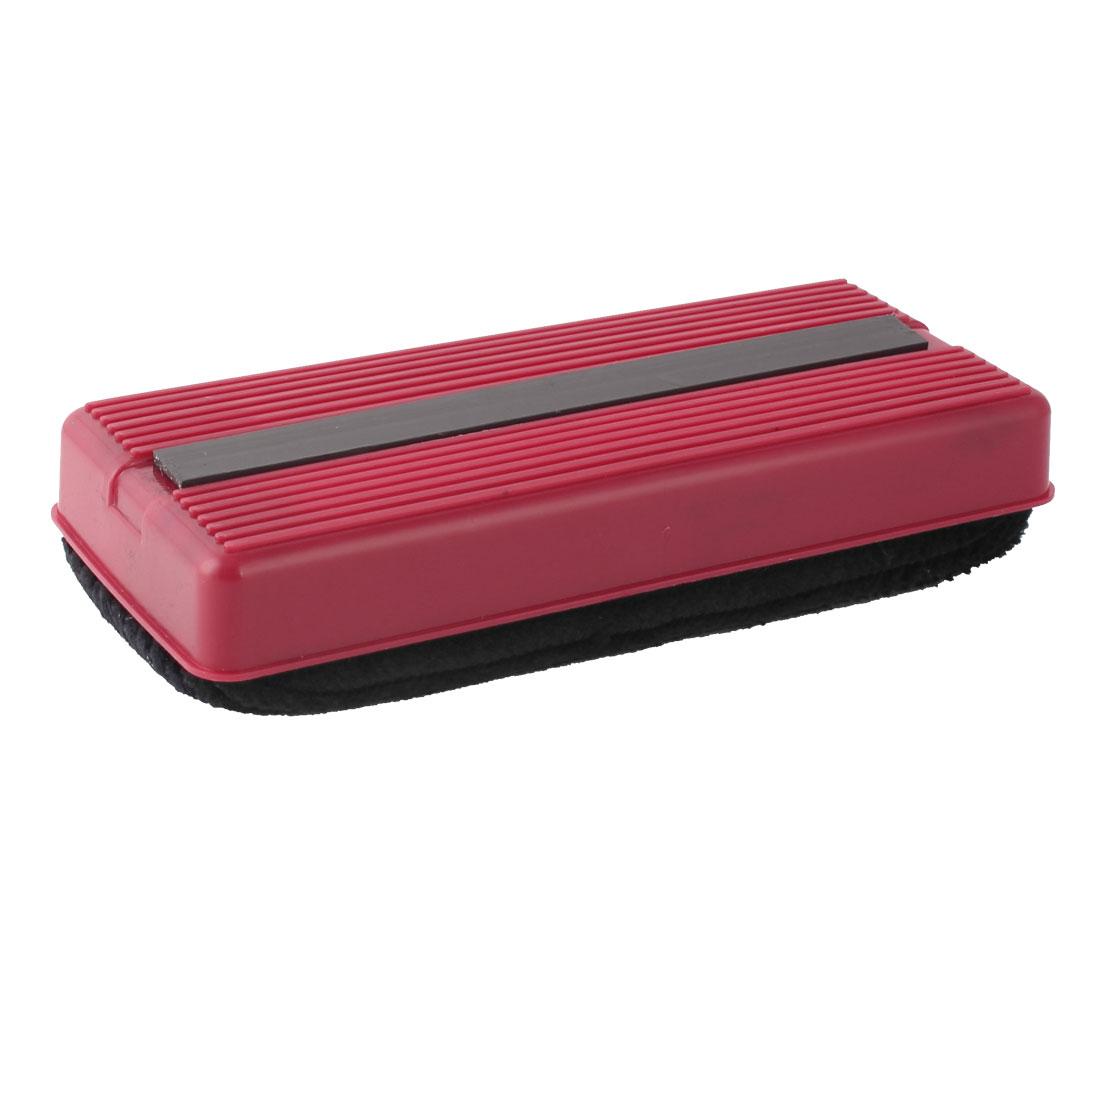 School Teaching Office Plastic Shell Magnetic Blackboard Eraser Red Black